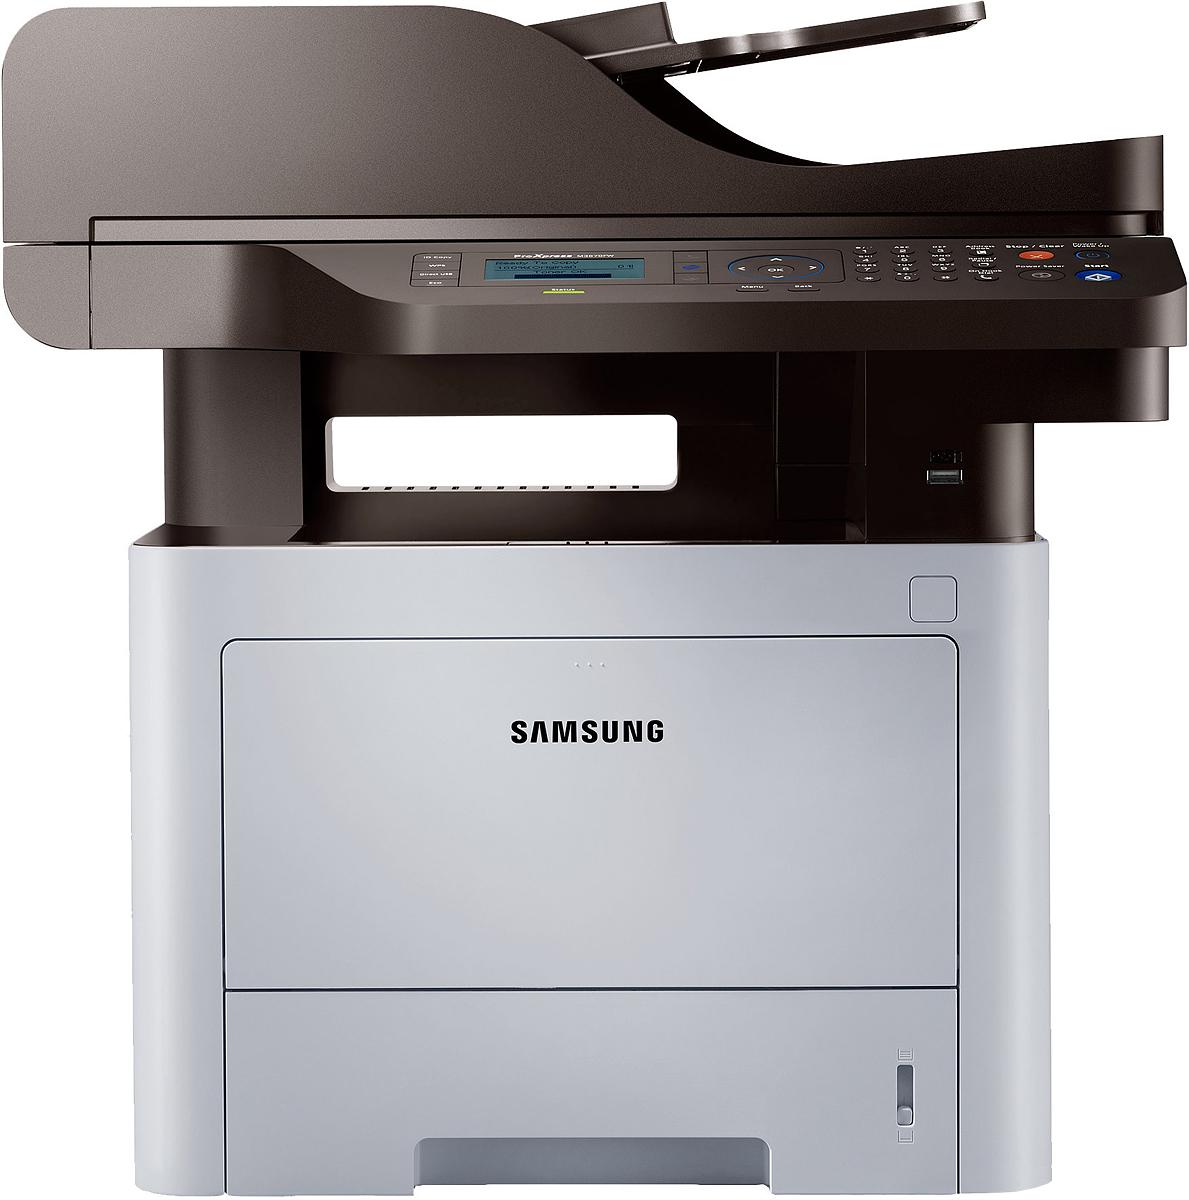 Samsung ProXpress SL-M3870FW МФУ